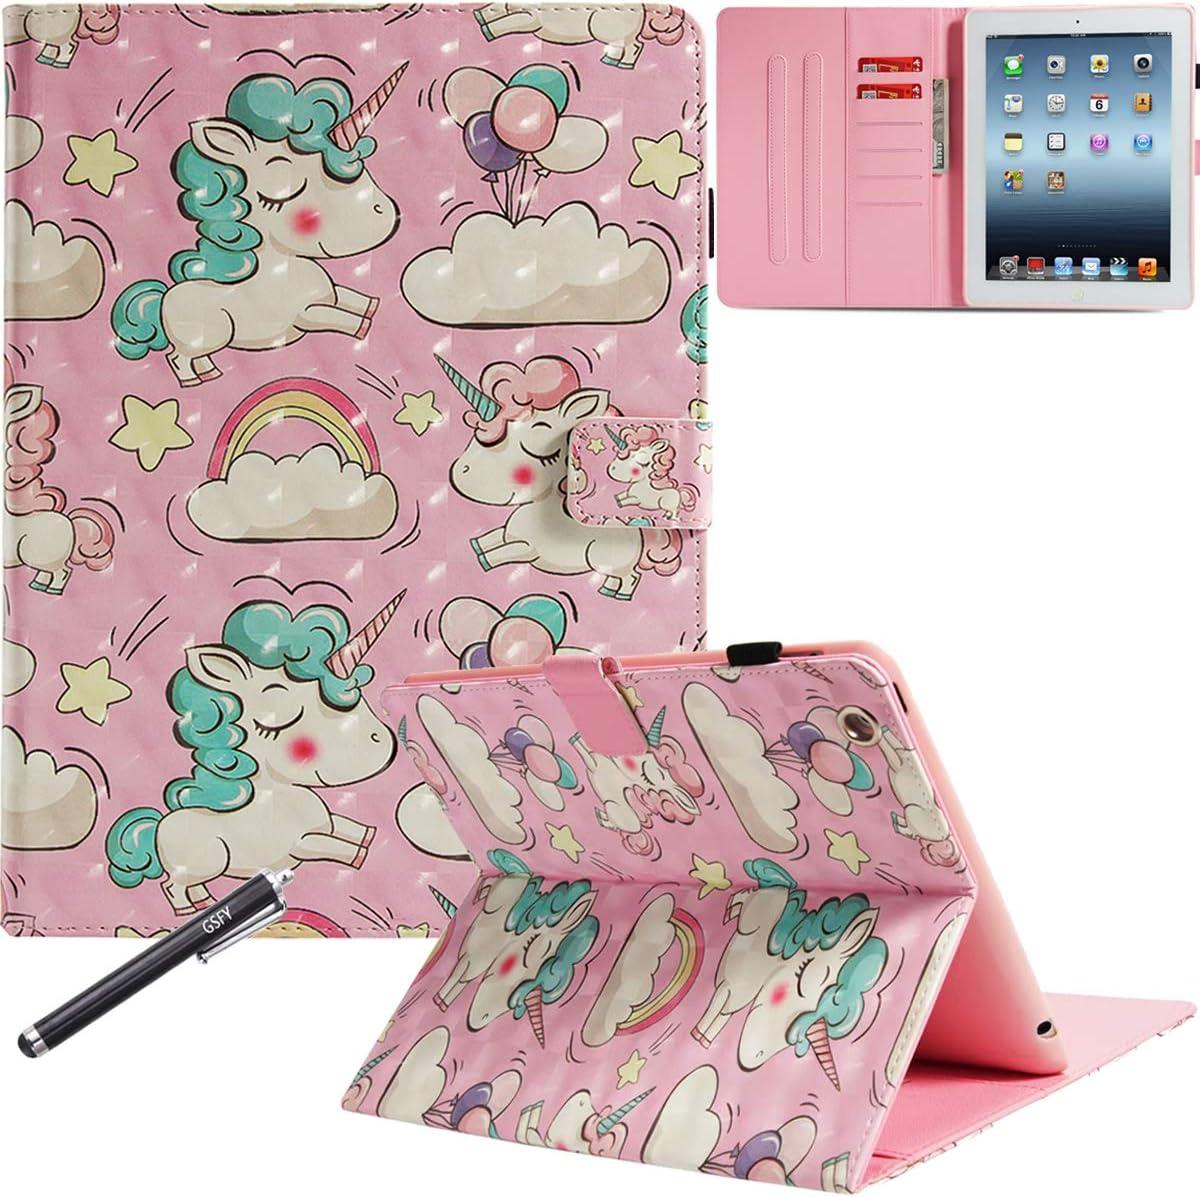 iPad 2/3/4 Case - Newshine PU Leather Stand Folio Cover with Auto Wake/Sleep Card Slots for 9.7 Inch (Old Model) Apple iPad 2, iPad 3 & iPad 4th Gen with Retina Display - Blue Unicorn